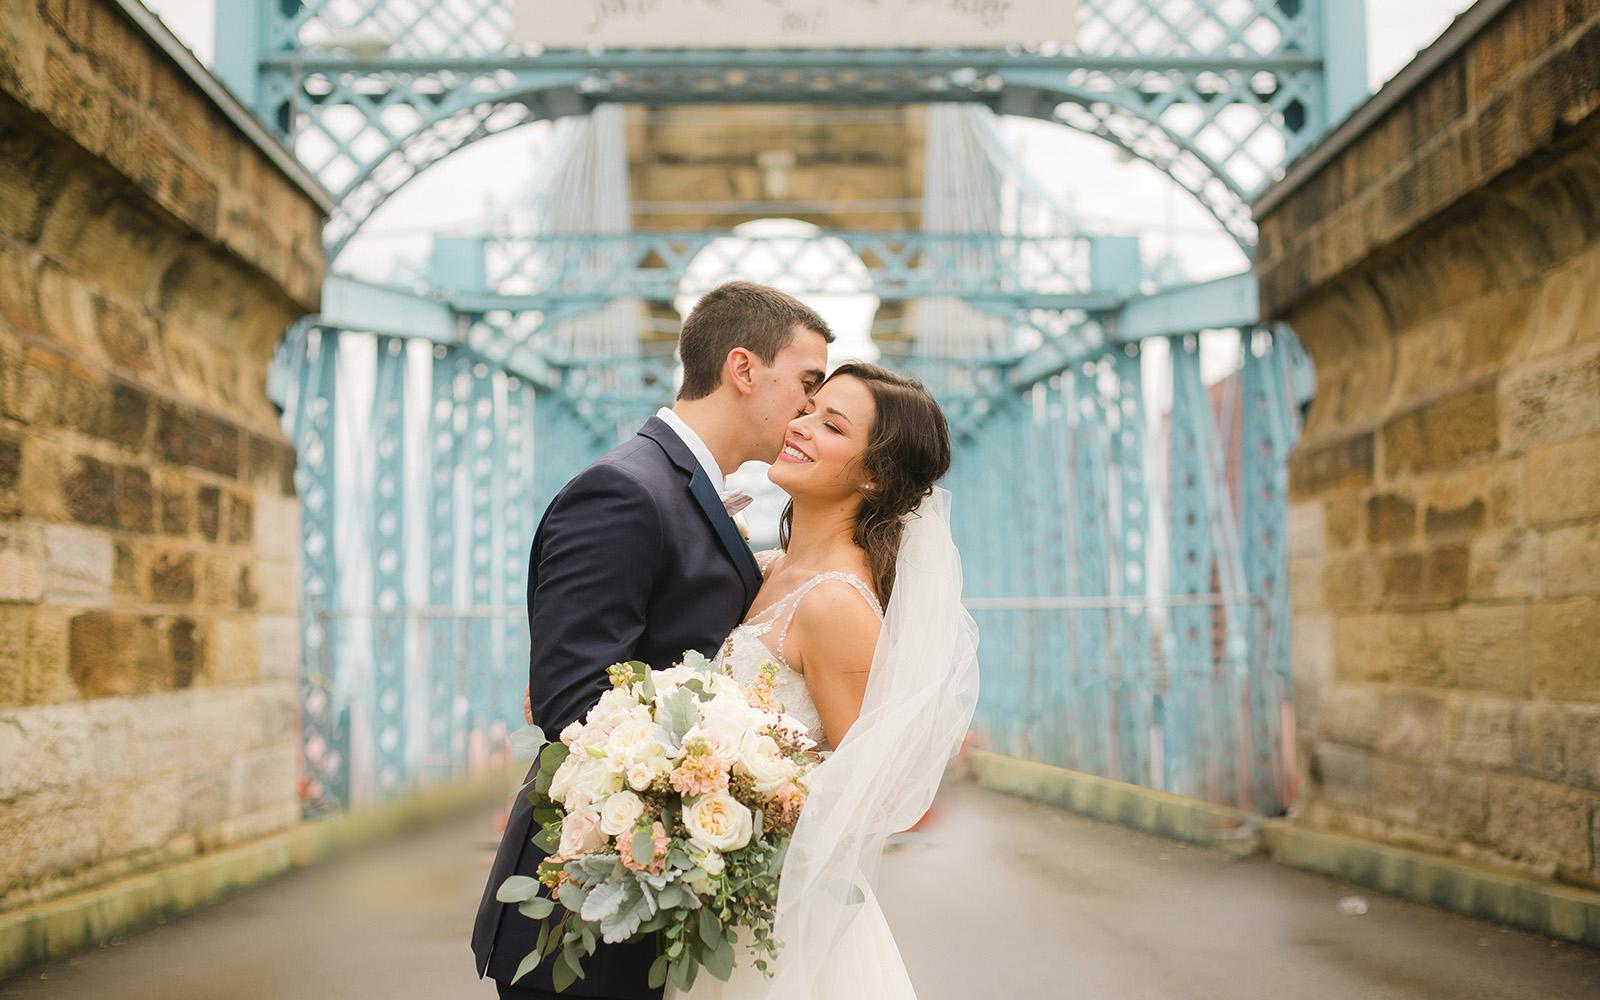 ALICIA & LAUDI WEDDING